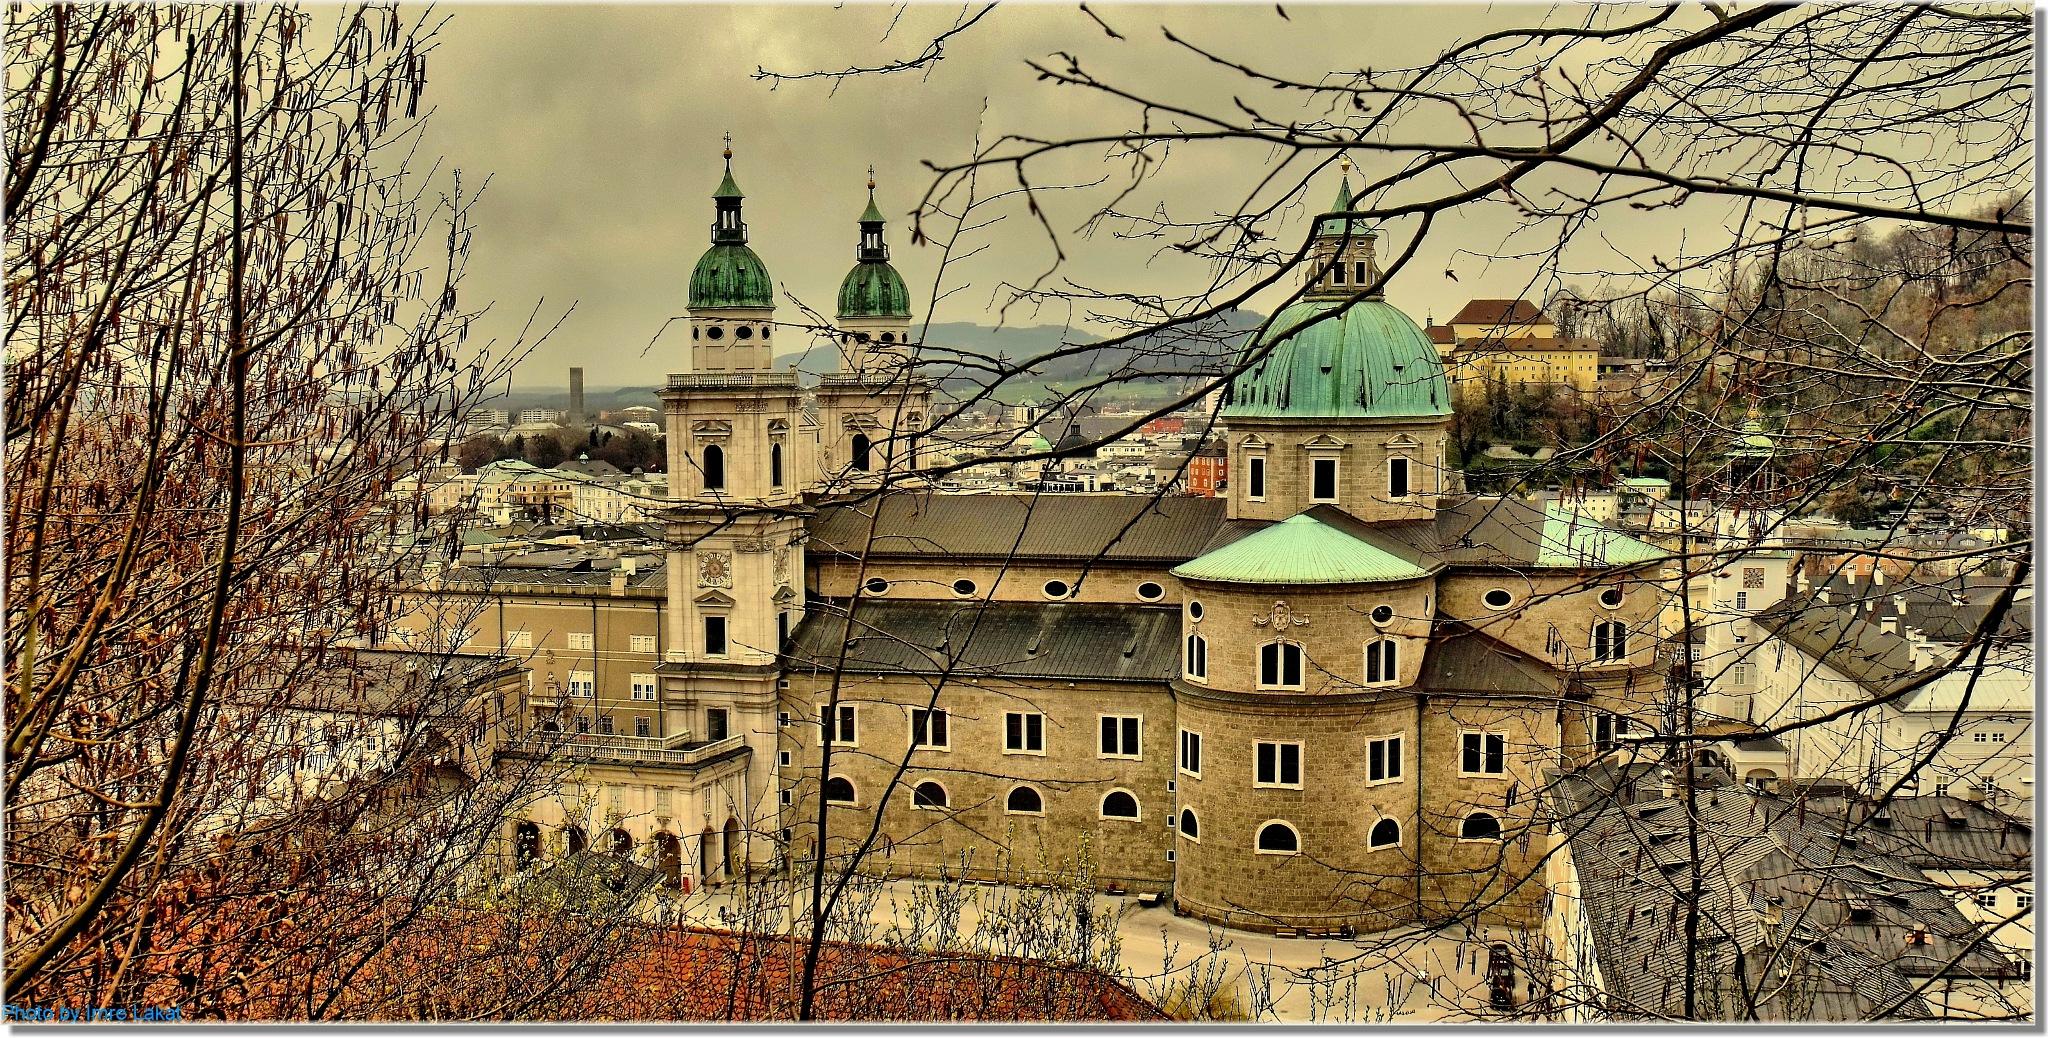 Salzburg Cathedral ... Festungsgasse 10, 5020 Salzburg, Ausztria by Imre Lakat